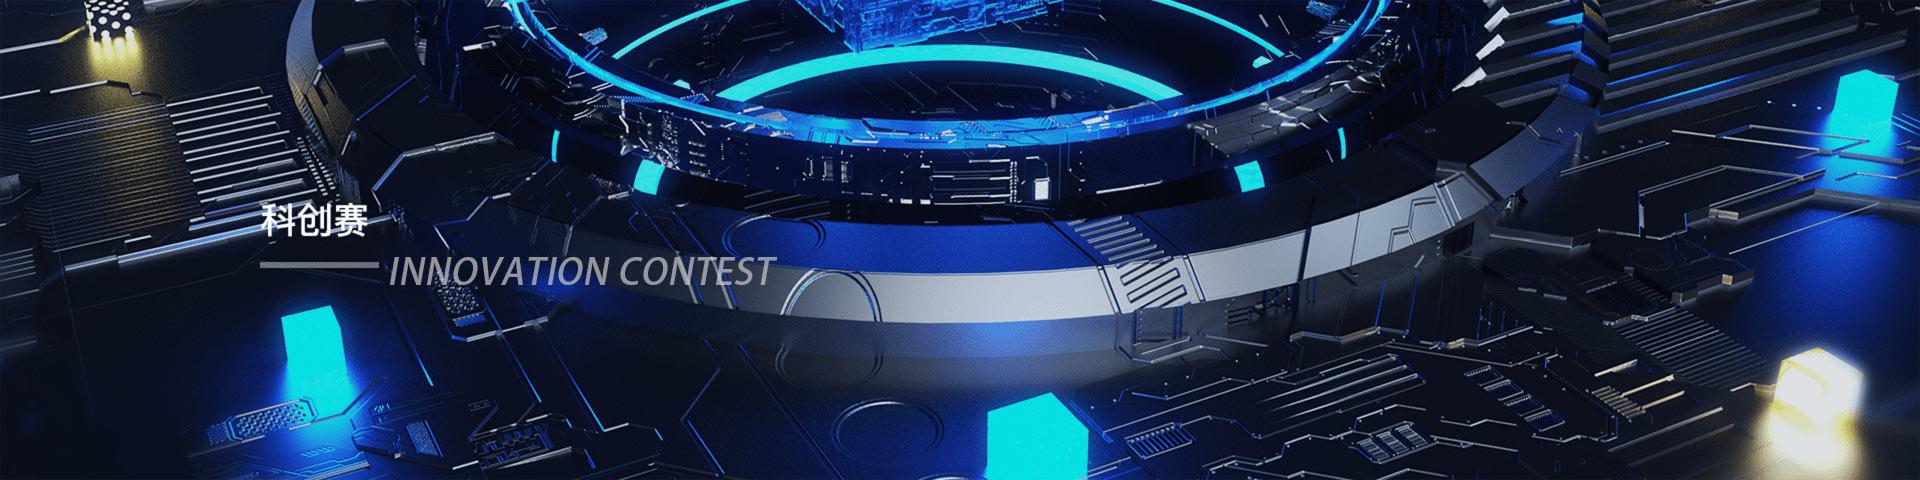 科创赛-人工智能banner